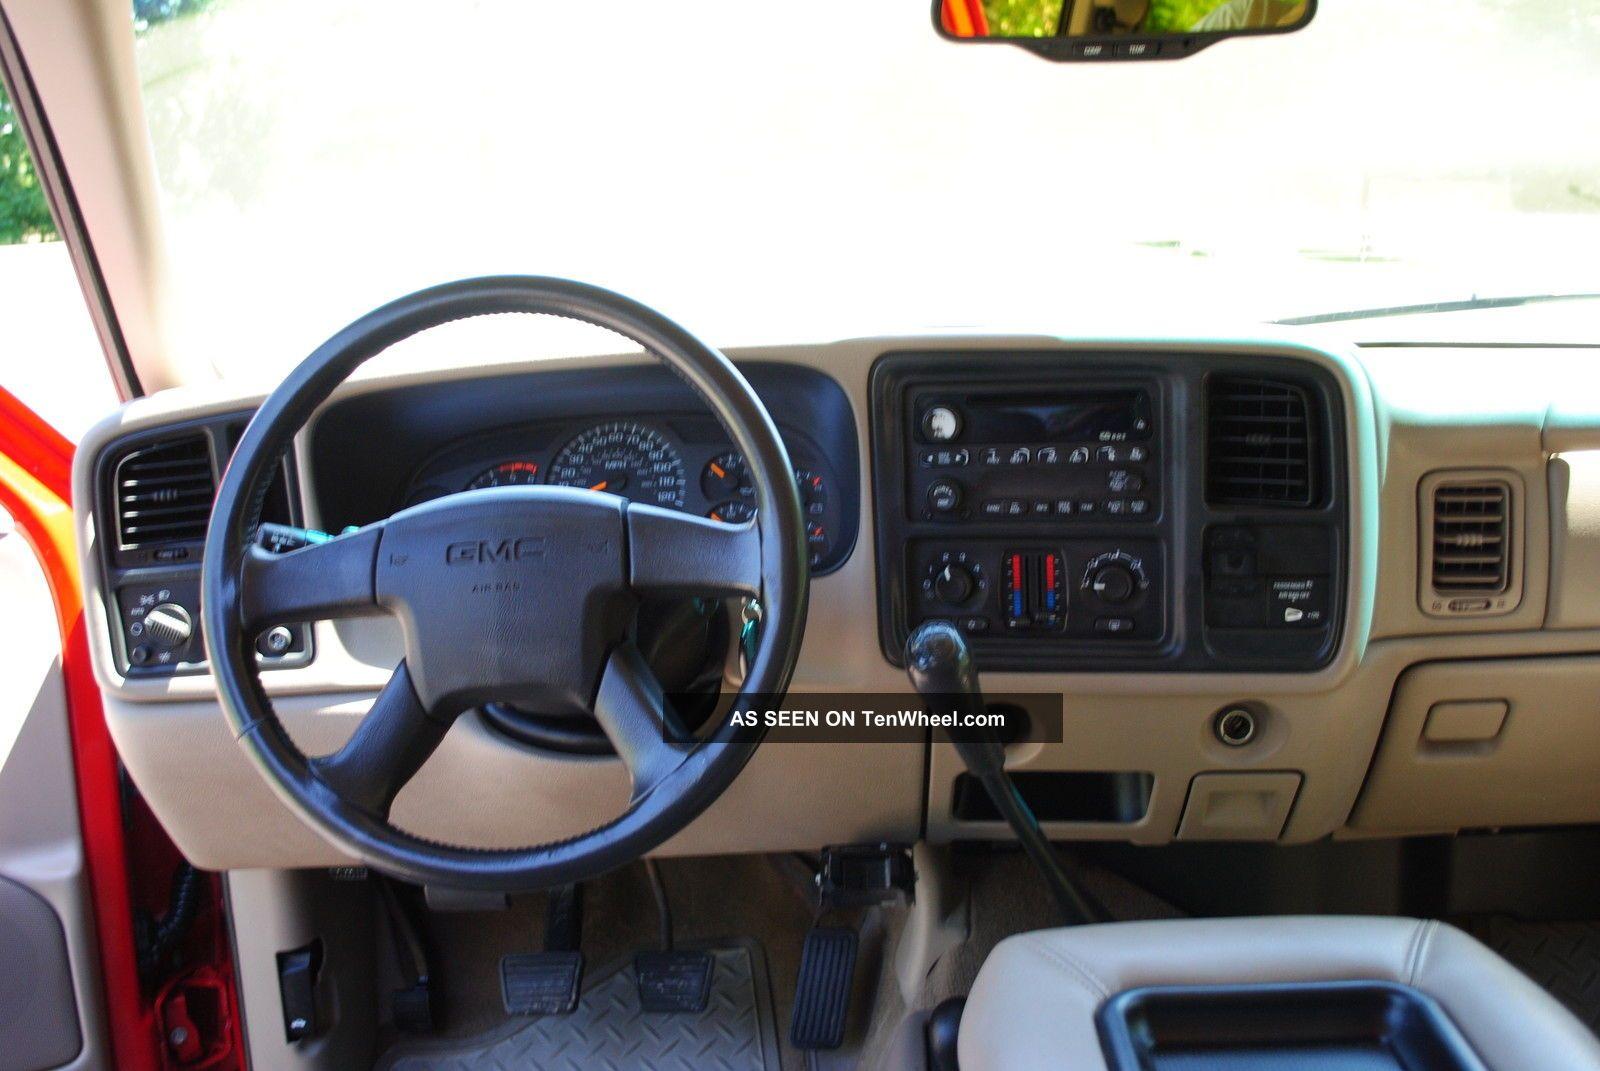 2014 Dodge Ram 3500 Diesel 6spd Manual Transmission.html | Autos Post